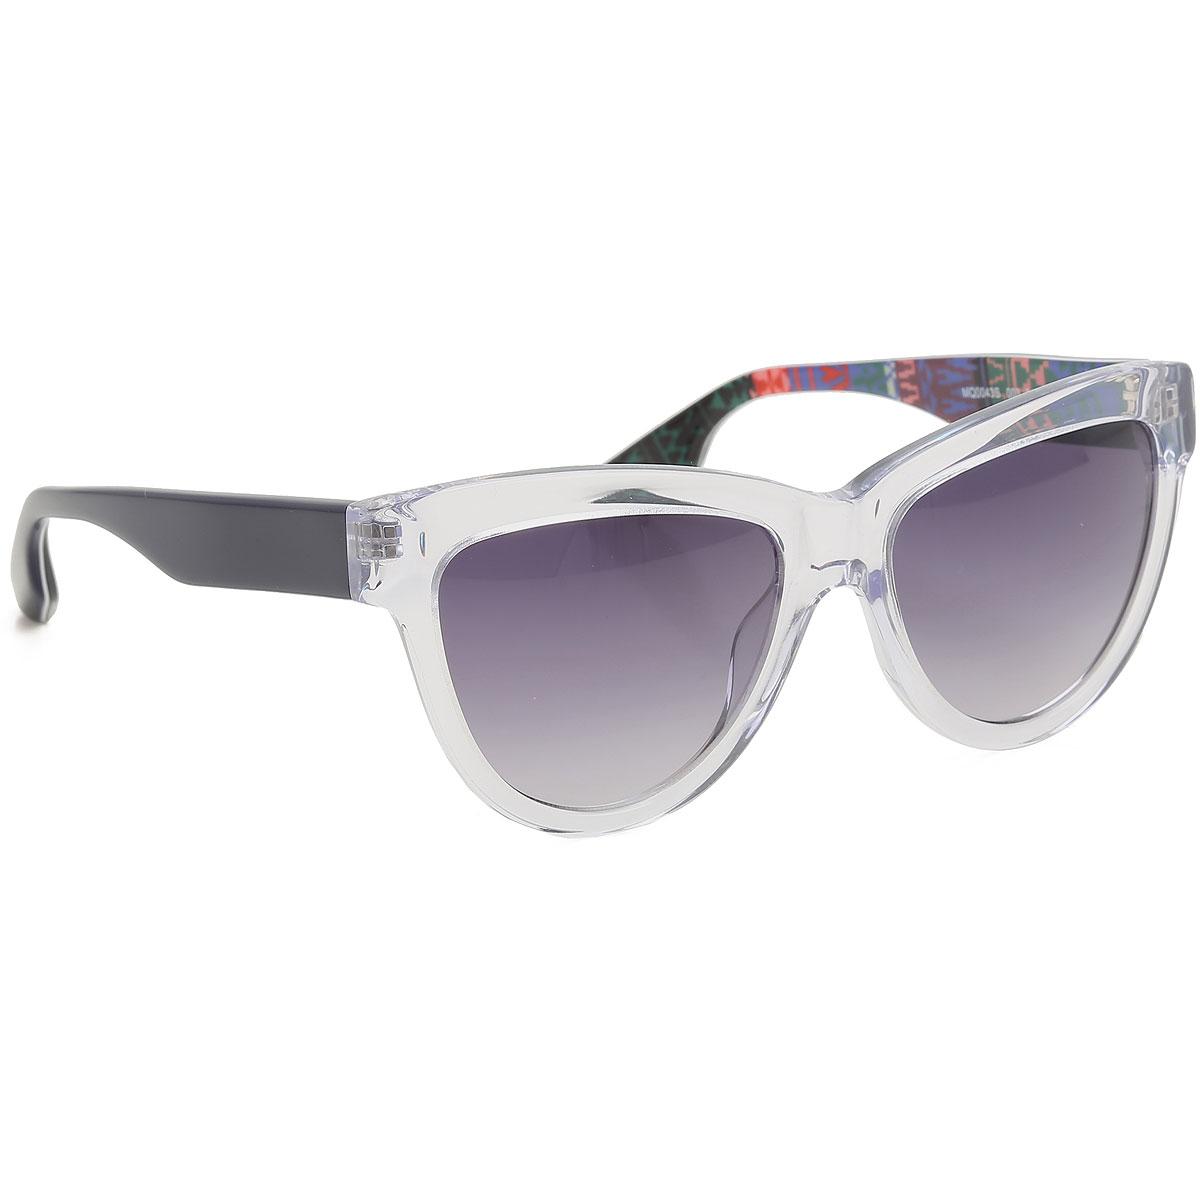 Alexander McQueen McQ Sunglasses On Sale, Crystal, 2019